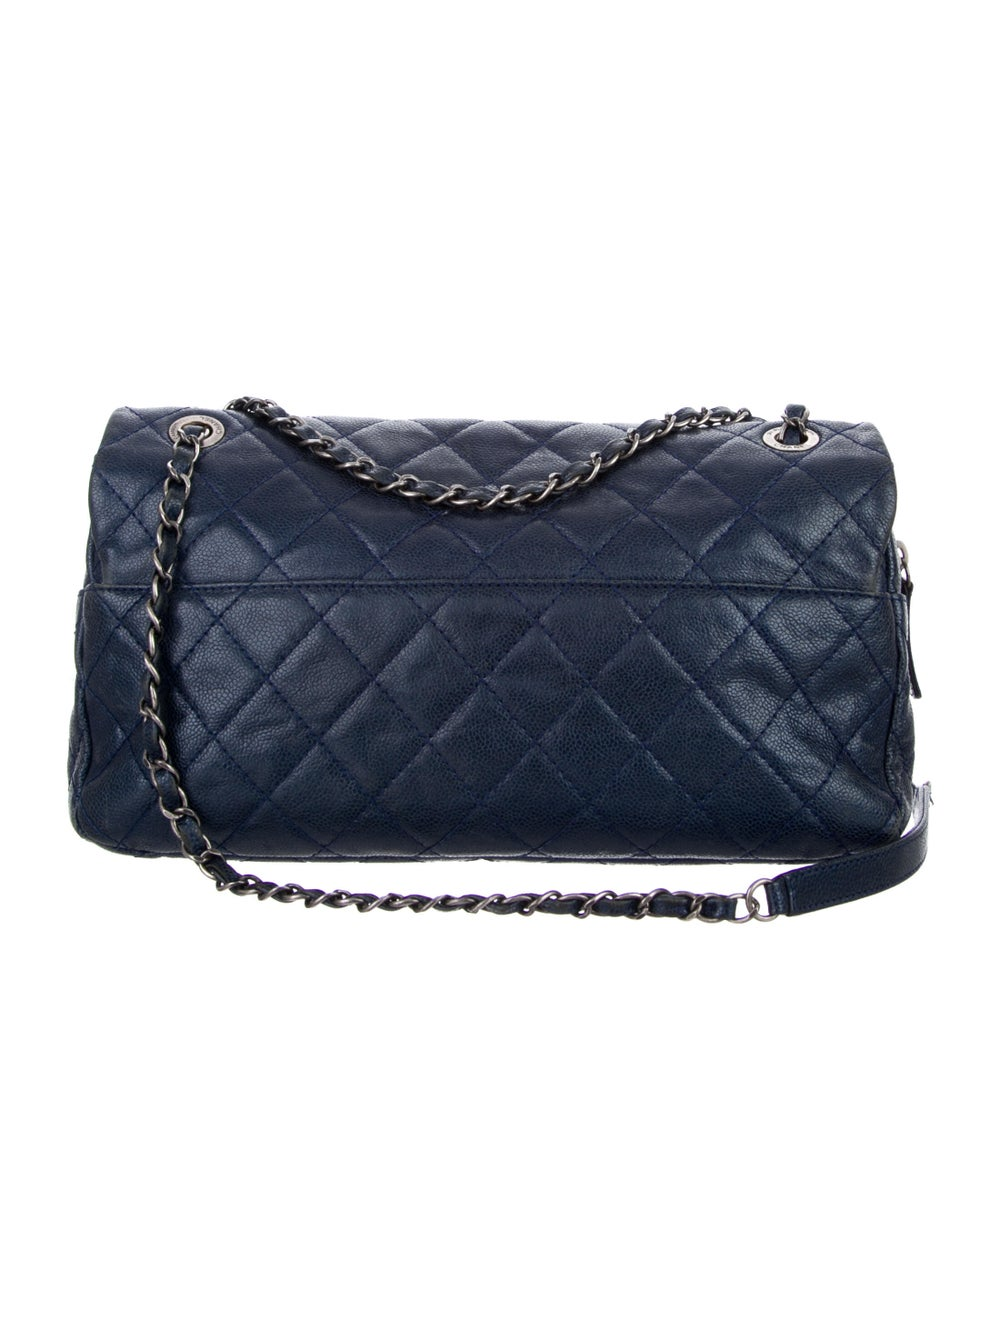 Chanel Jumbo Easy Caviar Flap Bag Blue - image 4